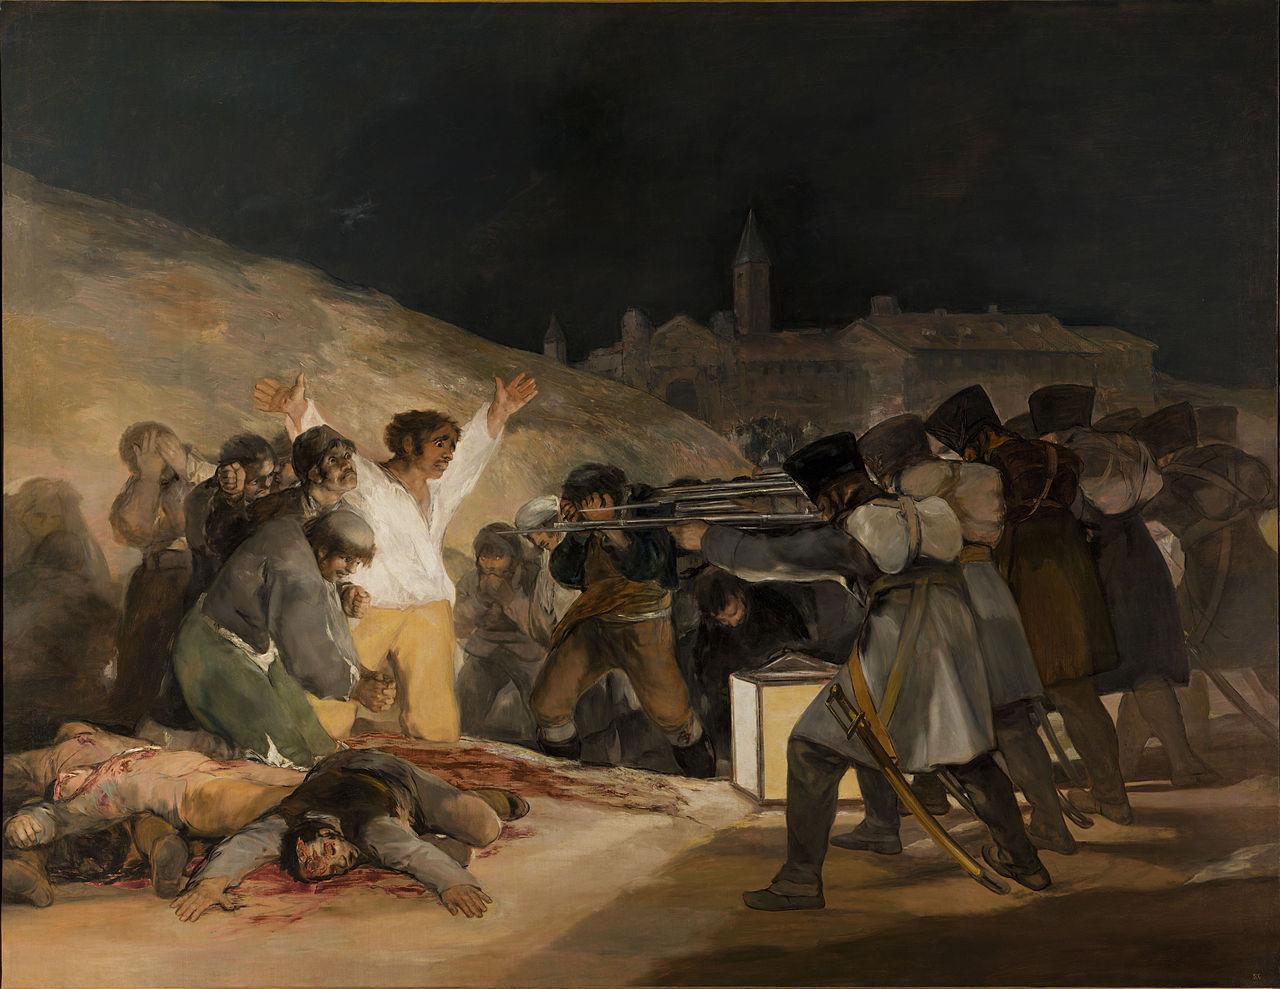 10 Artworks By Goya You Should Know